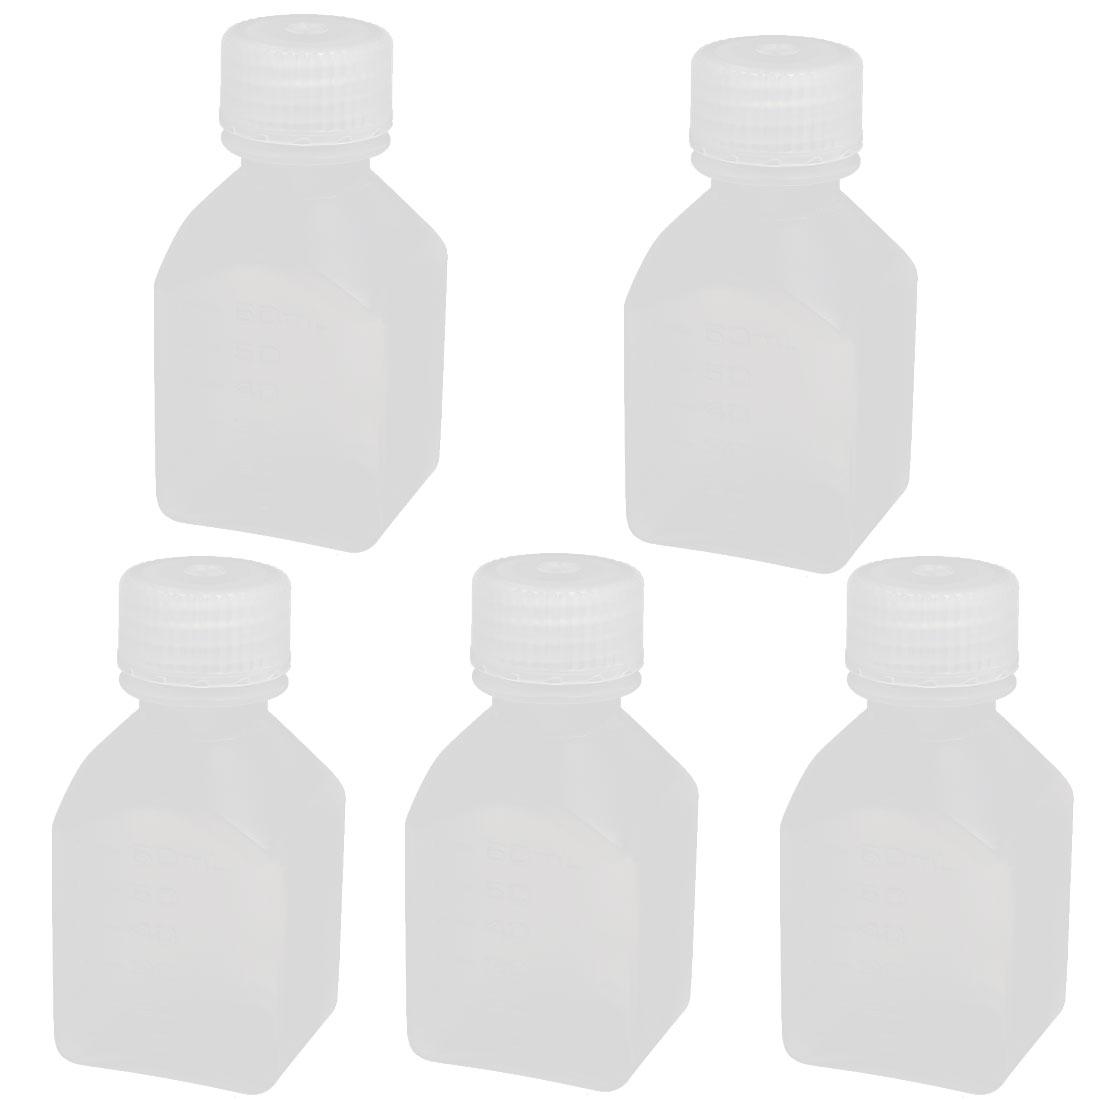 60ml 17mm Diameter PE Plastic Oblong Shaped Wide Mouth Bottle Clear 5pcs